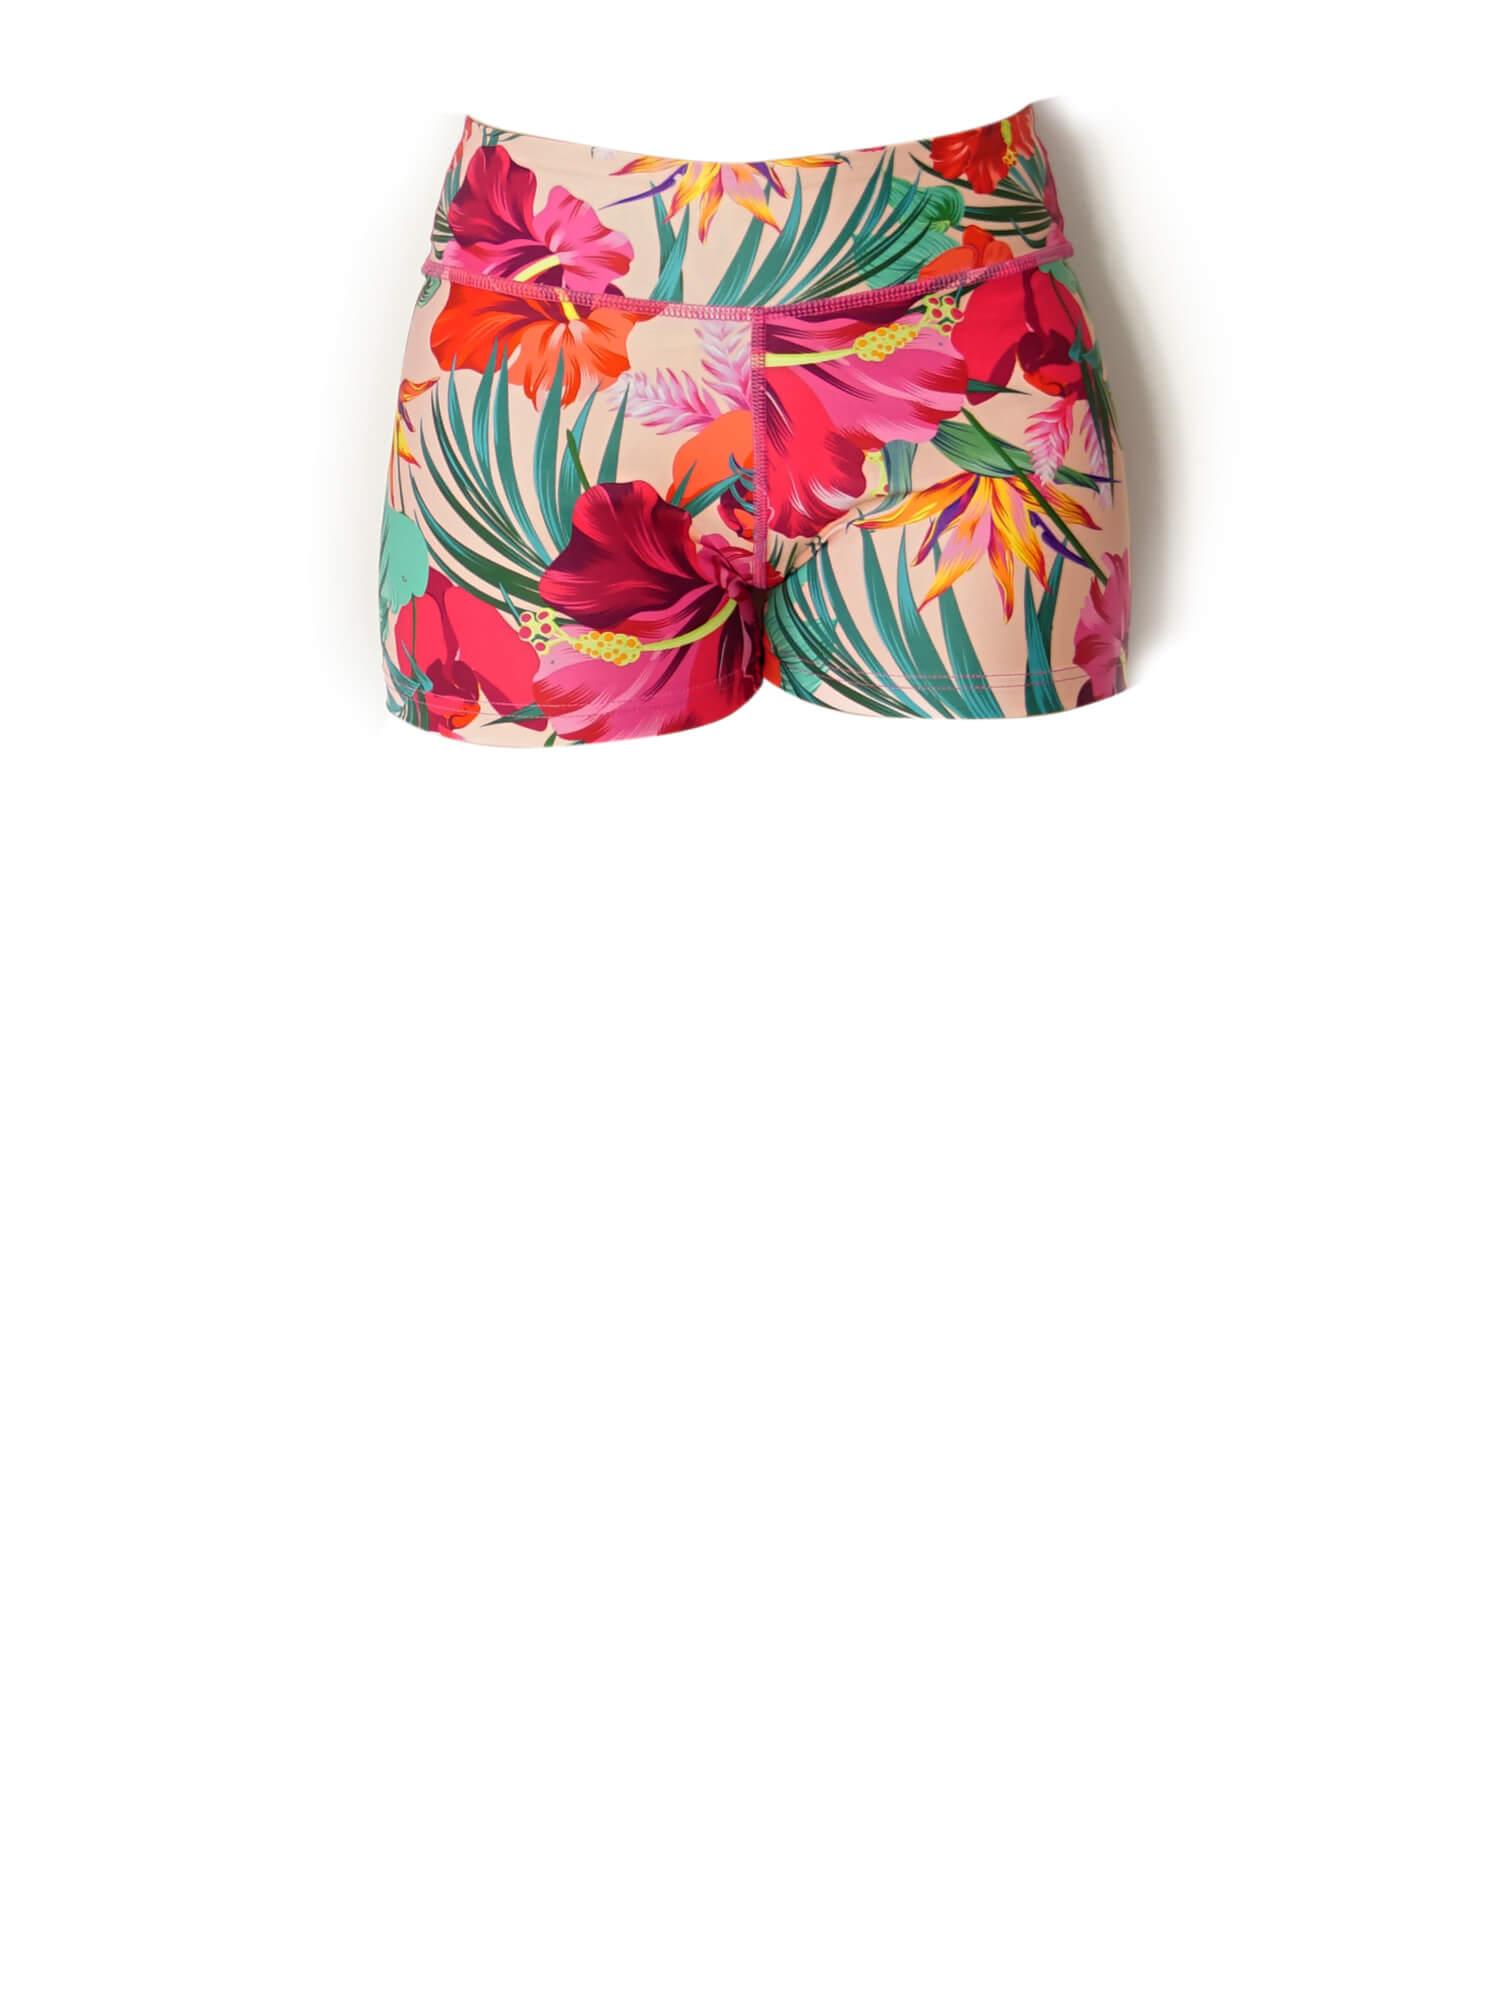 Honolulu-BootyShort-femme-pinkFlower